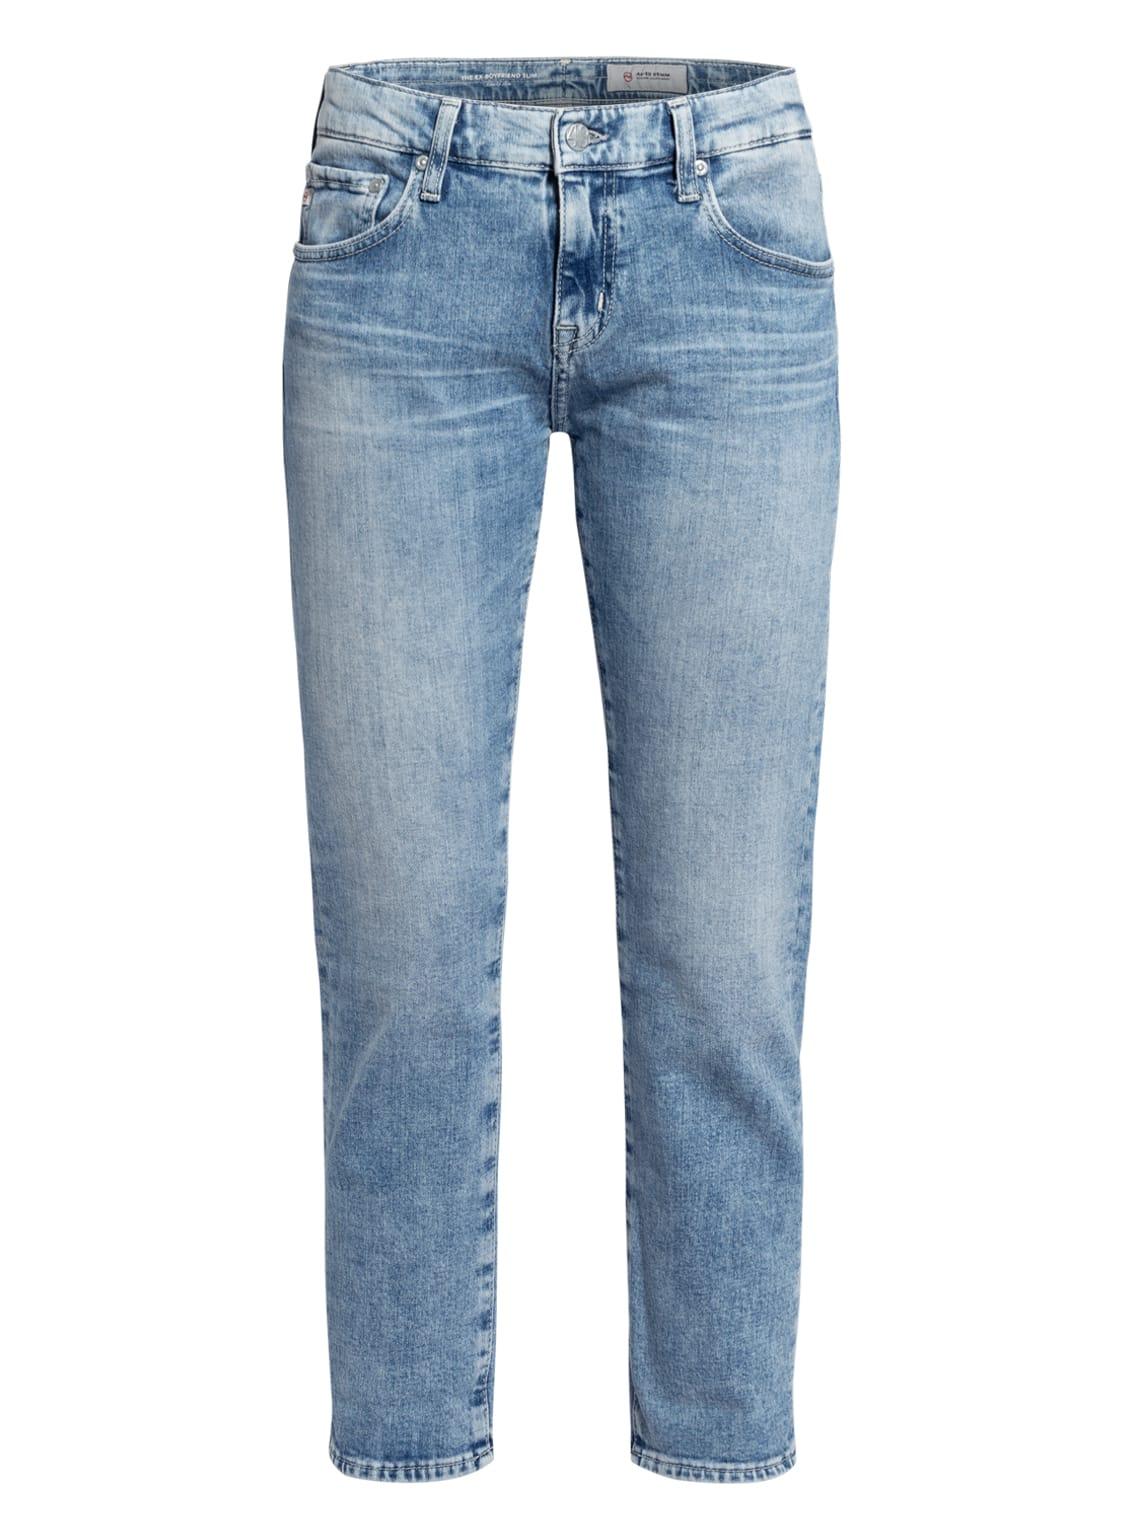 Image of Ag Jeans 7/8-Jeans The Ex-Boyfriend blau